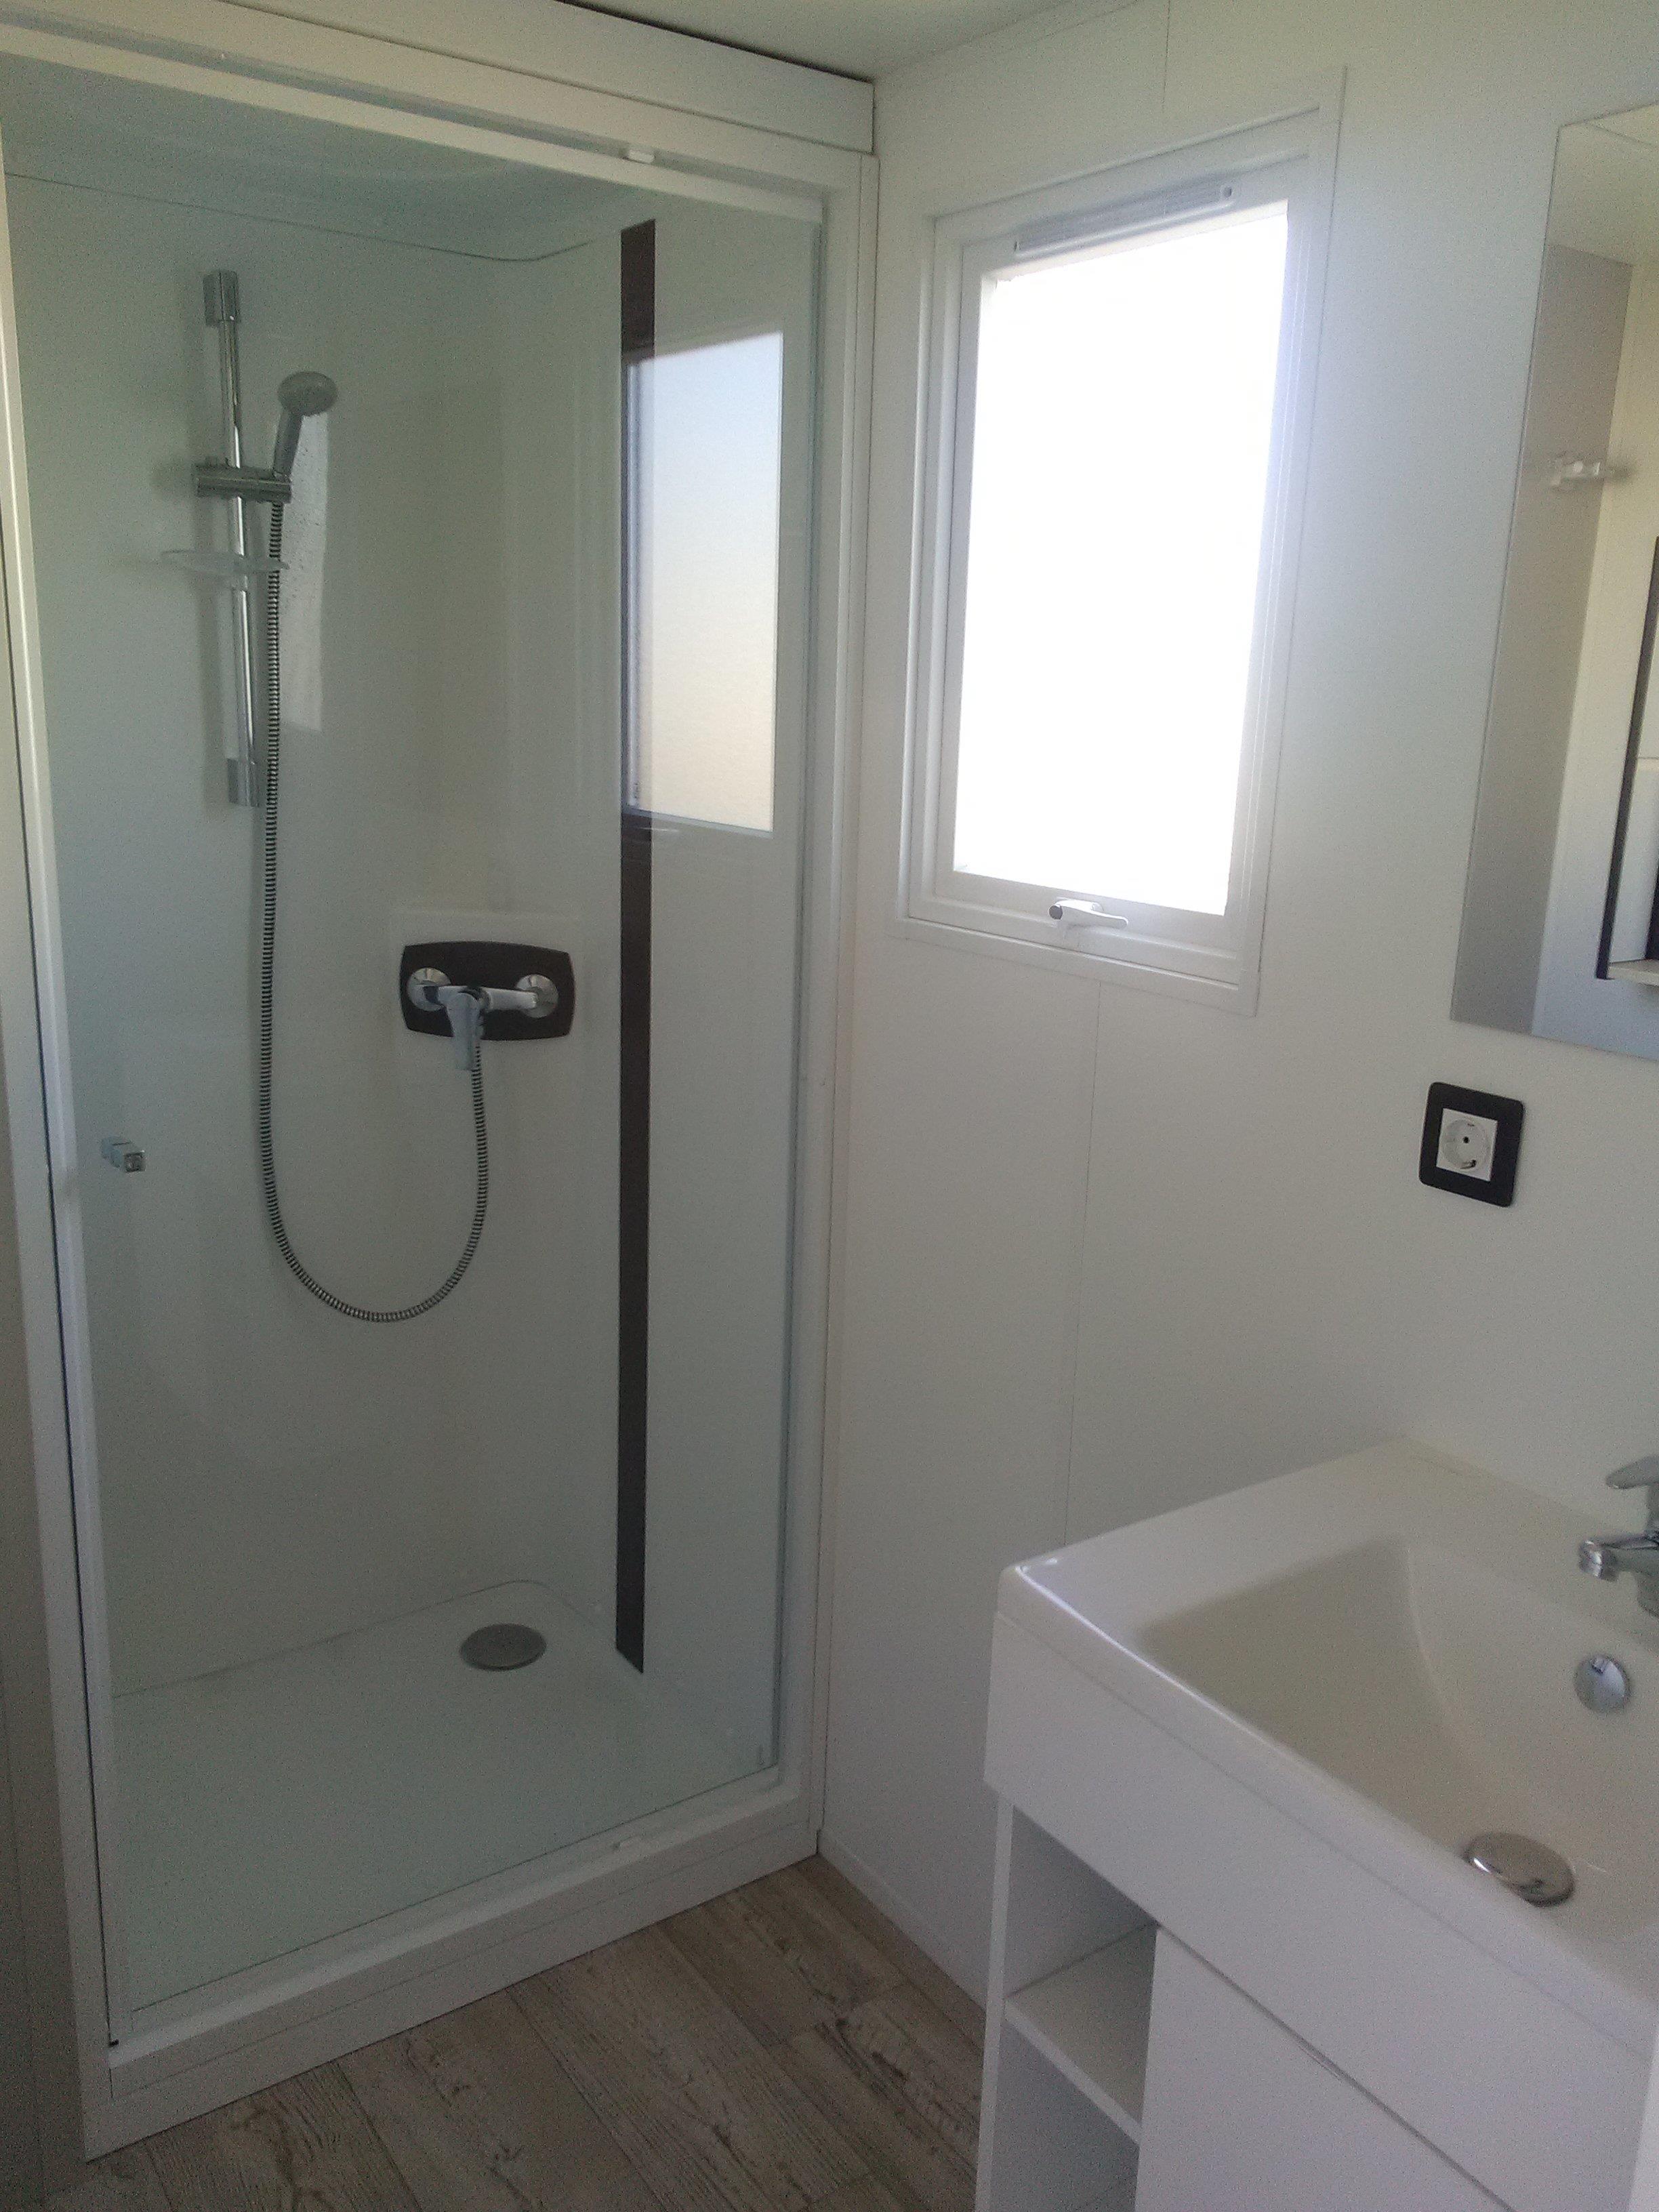 Location - Mobil-Home Louisiane Corail 3 Chambres 6Pers (Côté Plage) - Camping Les Saules